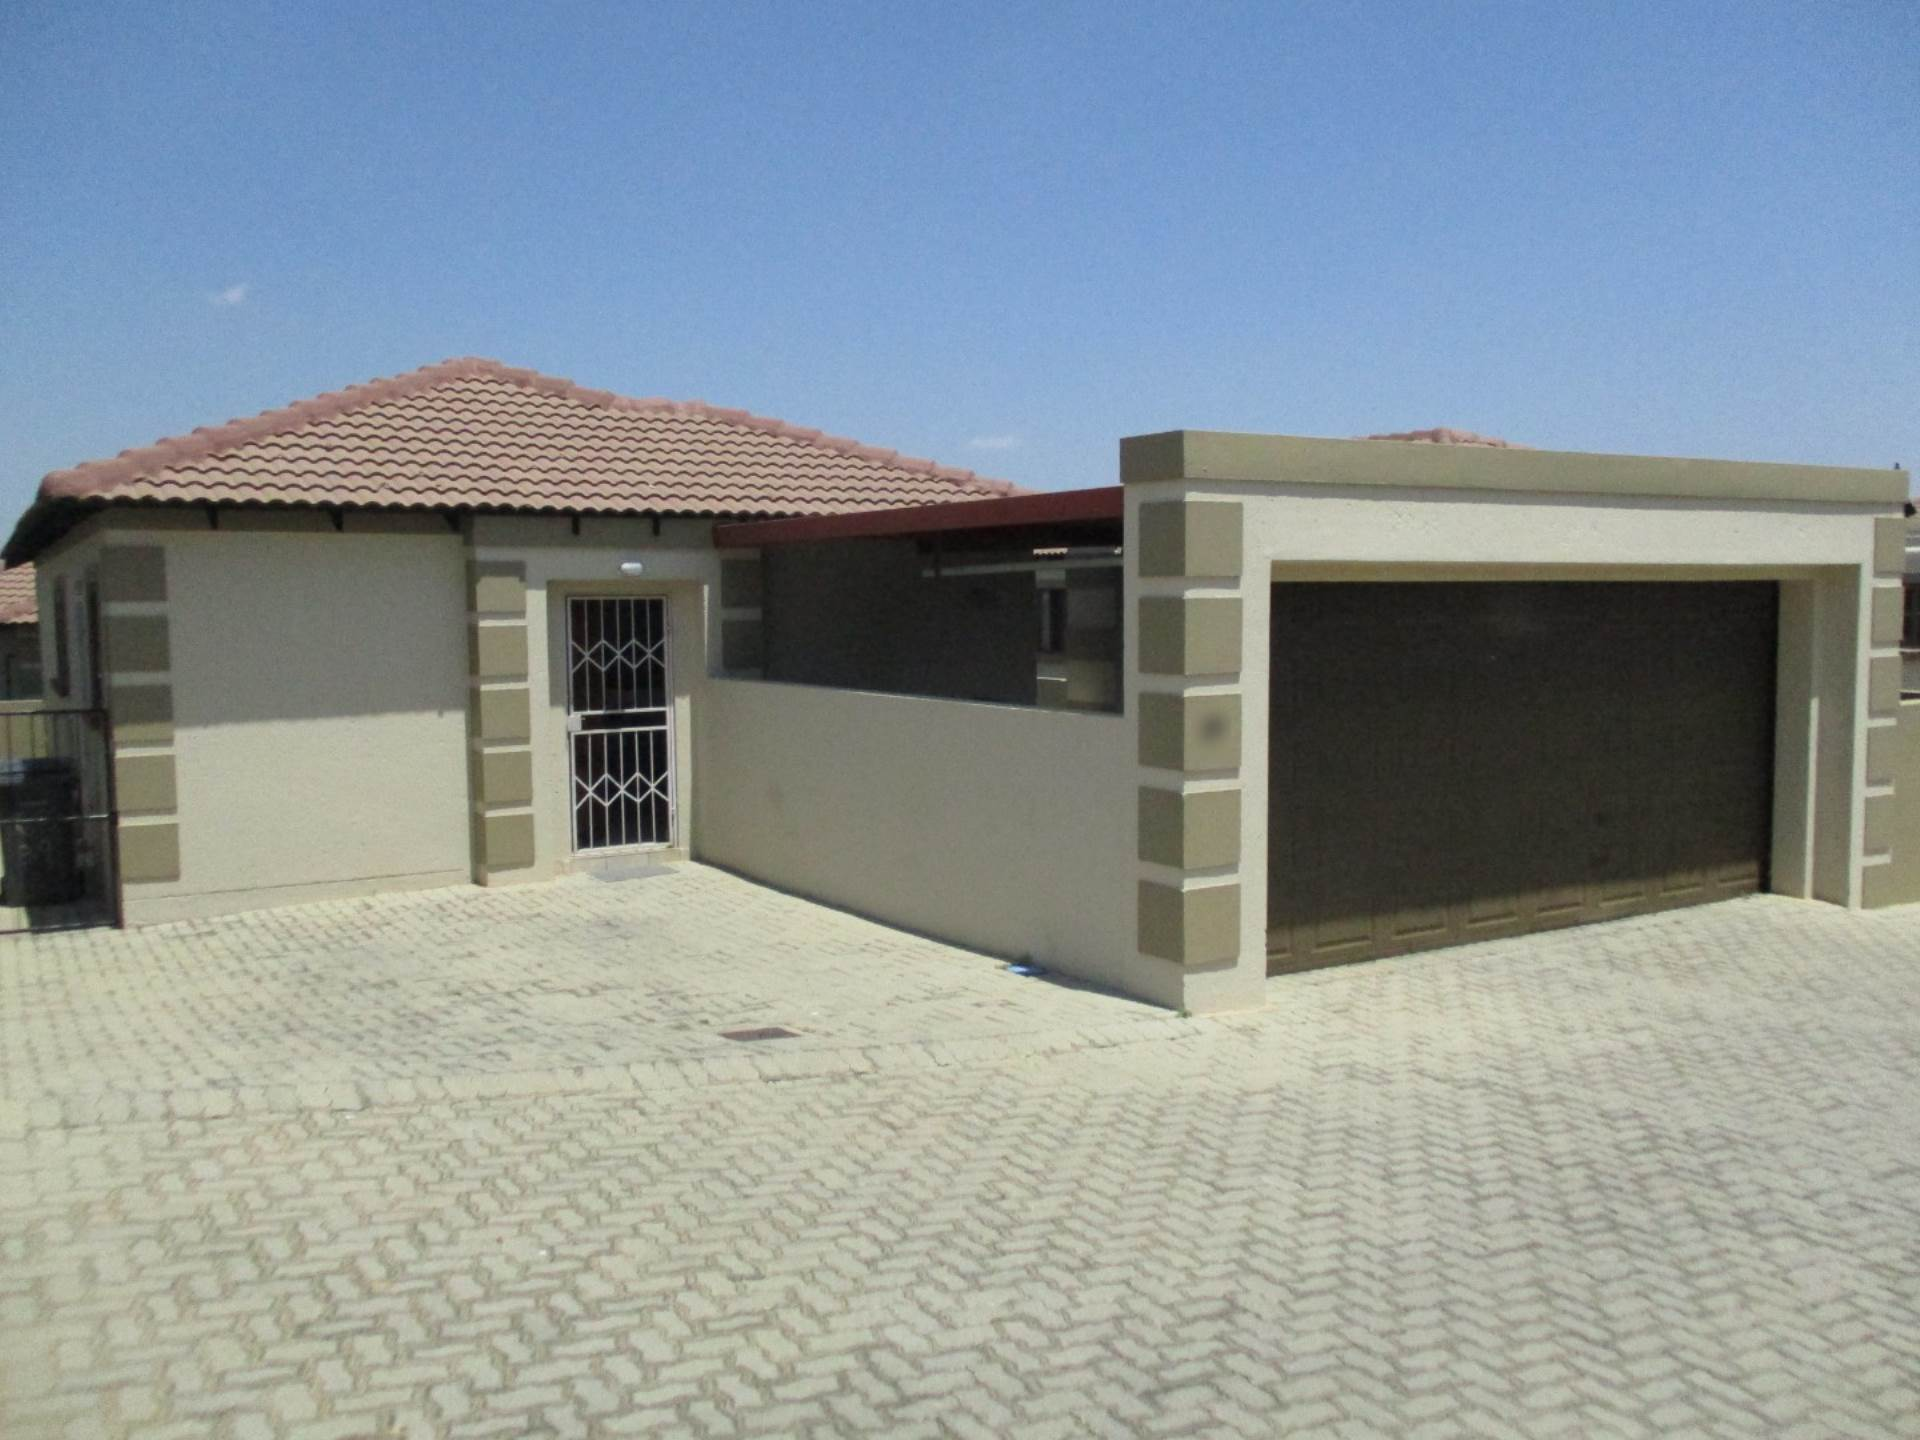 3 BedroomTownhouse To Rent In Arundo Estate